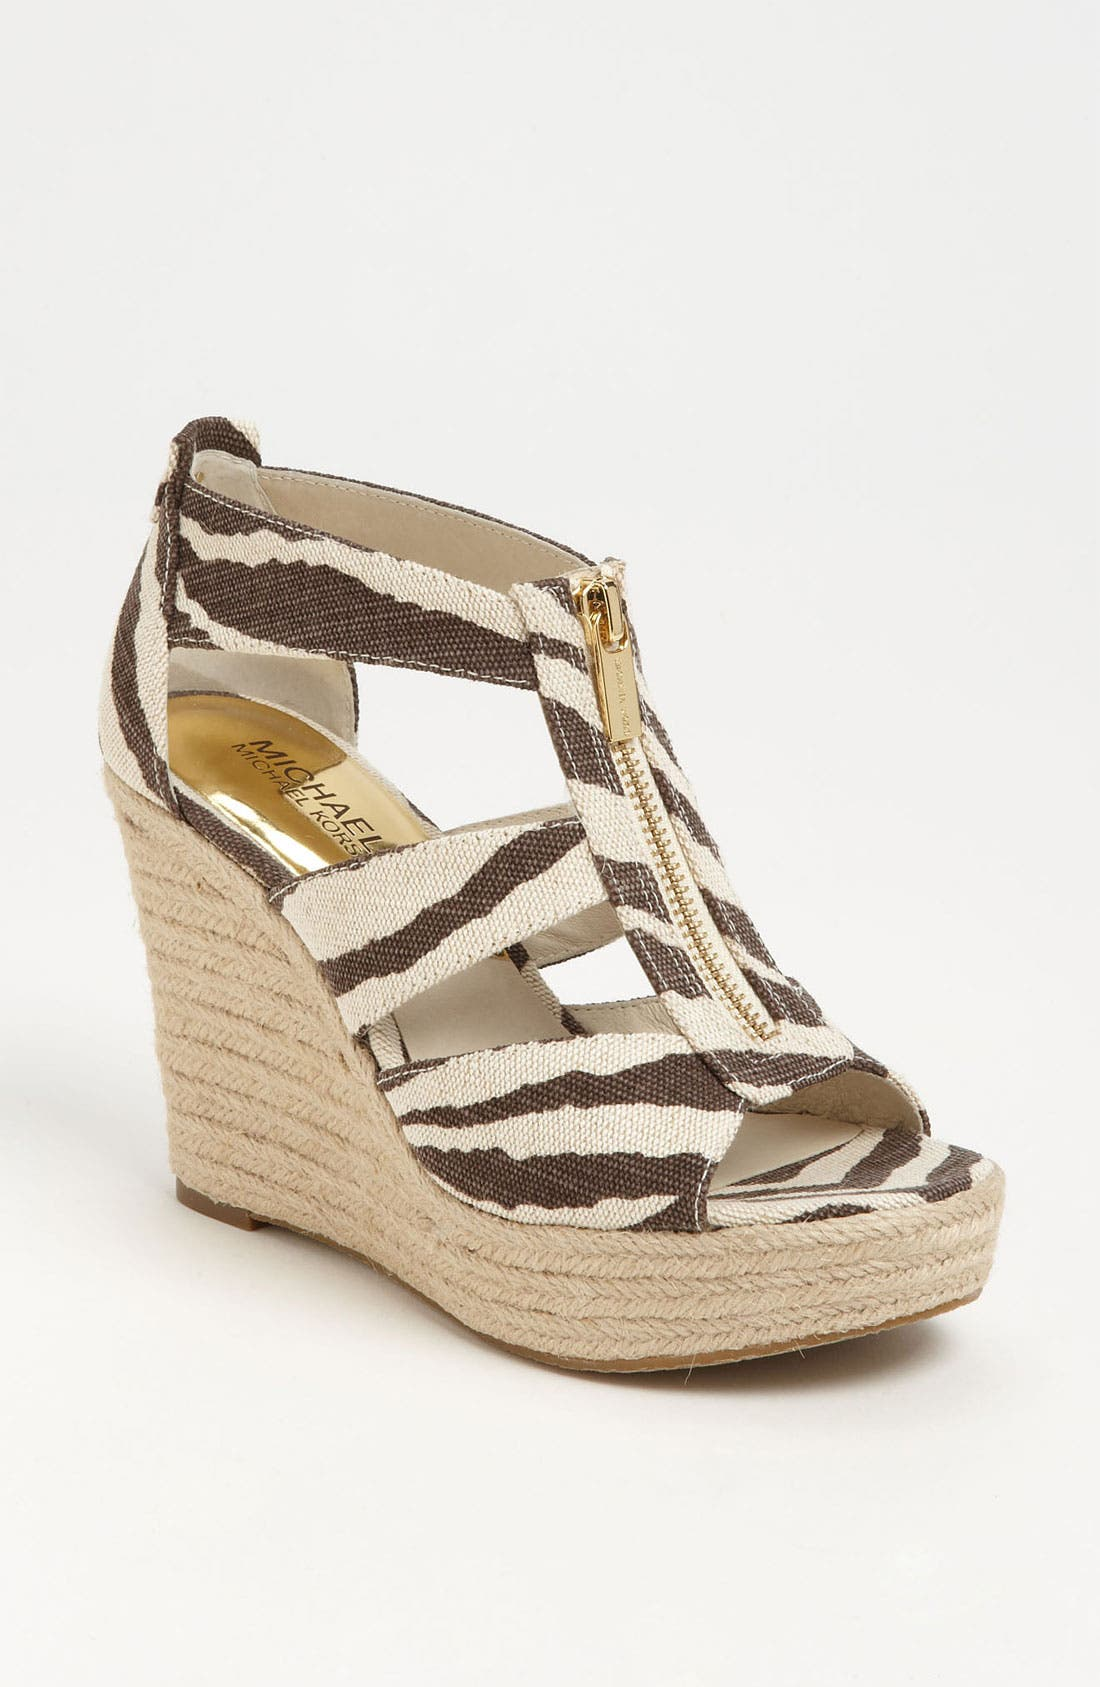 Main Image - MICHAEL Michael Kors 'Damita' Wedge Sandal (Women)